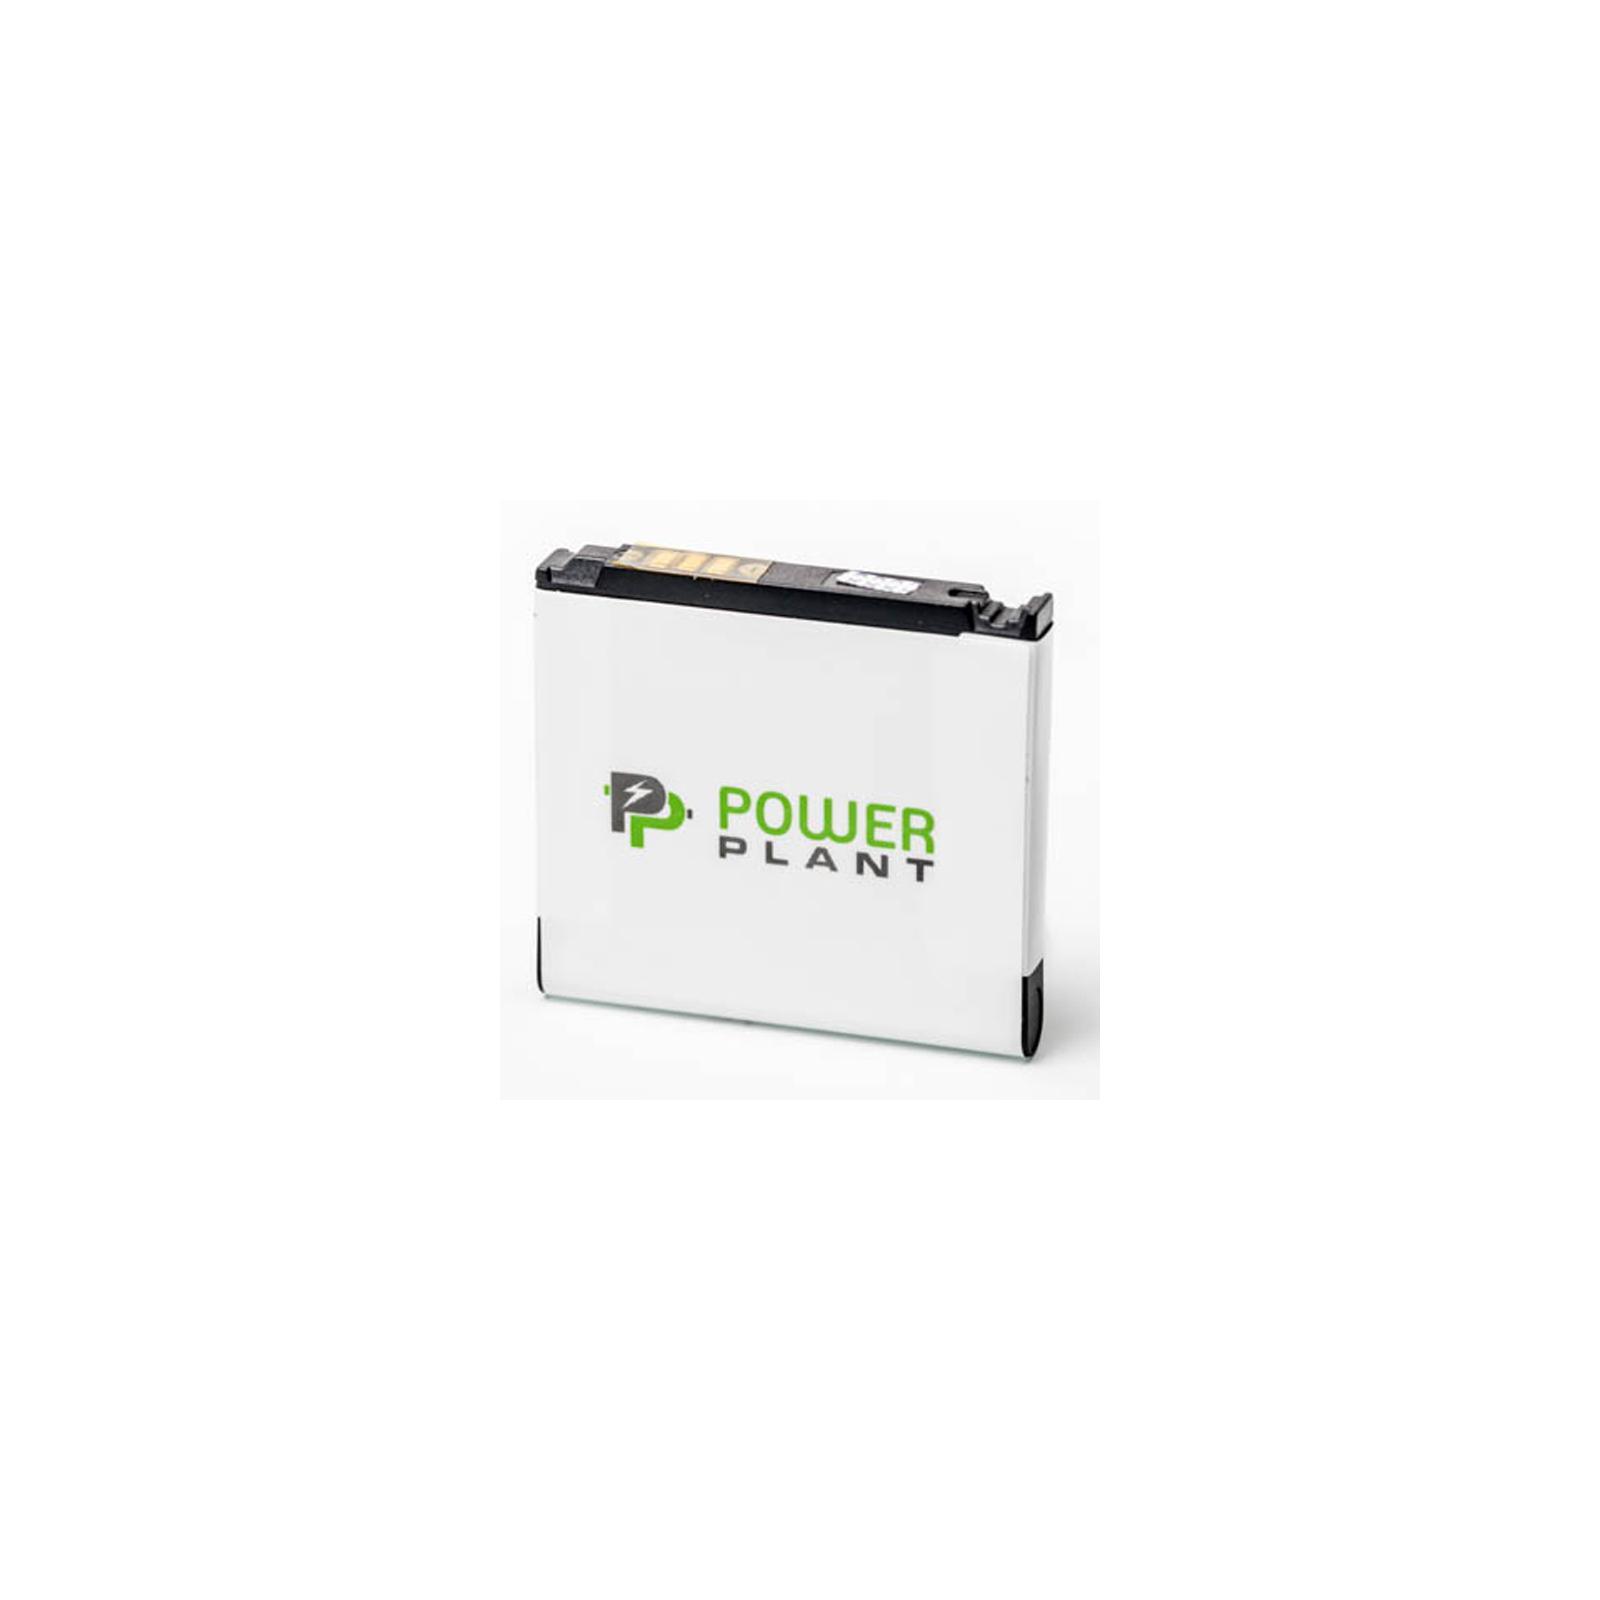 Аккумуляторная батарея PowerPlant Samsung G600, F330, P860 (DV00DV6046) изображение 2